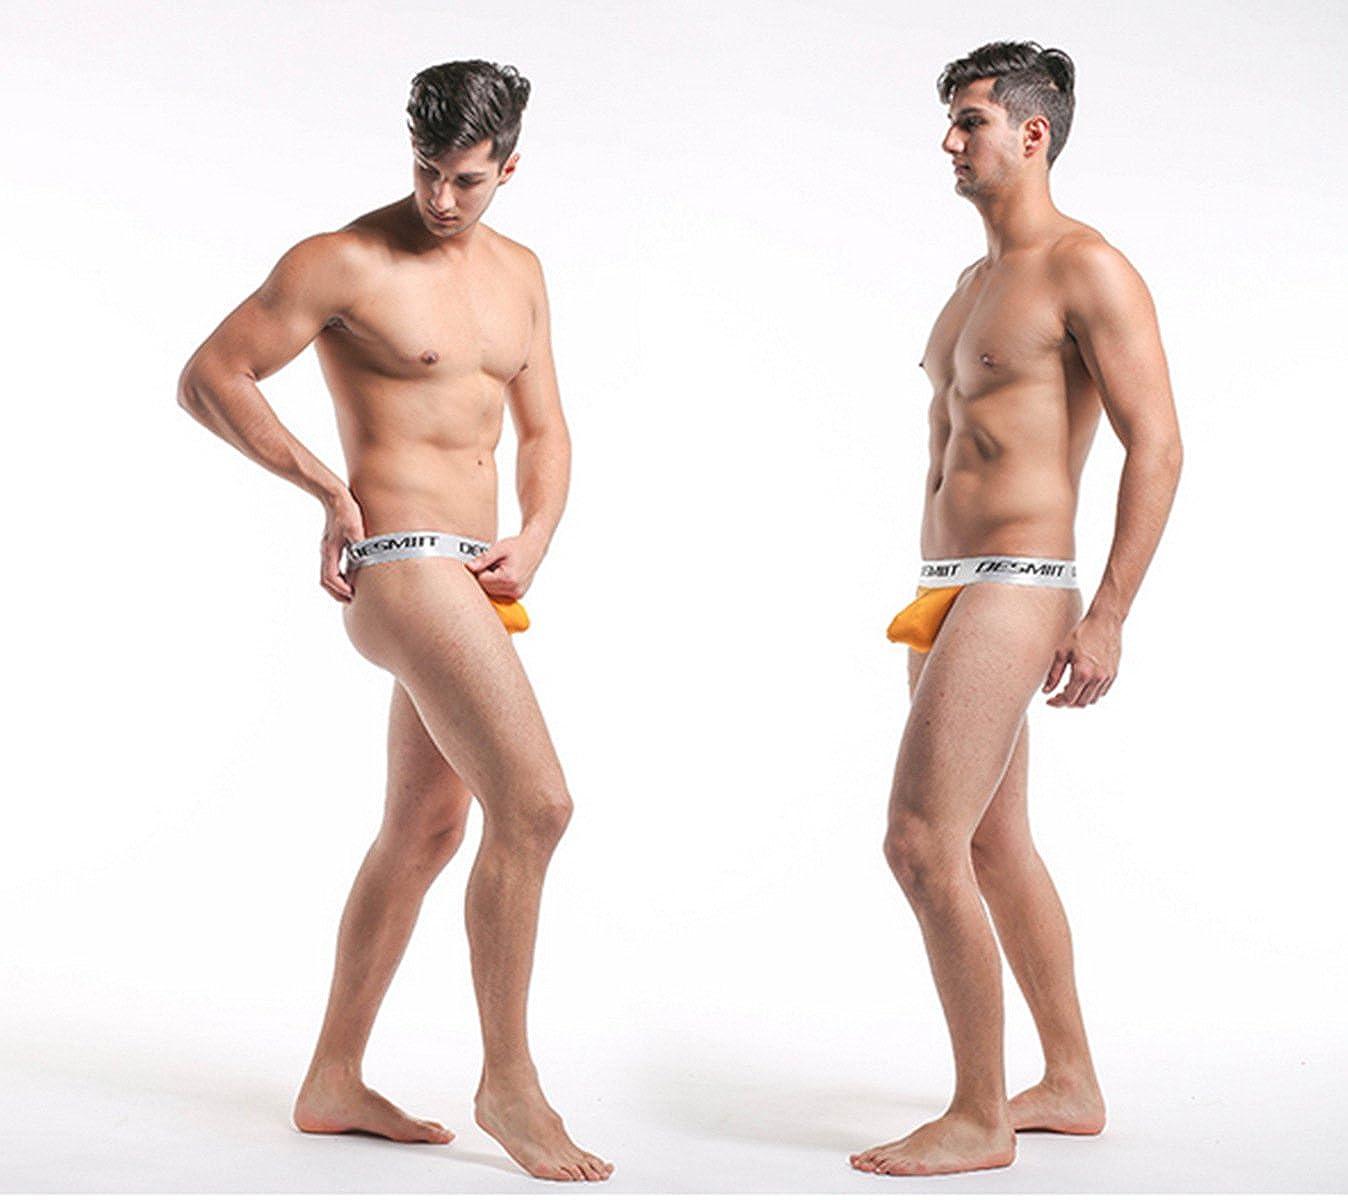 Meijunter Men Hyperelastic Underwear Comfort Low Waist G-string T-back Underpant